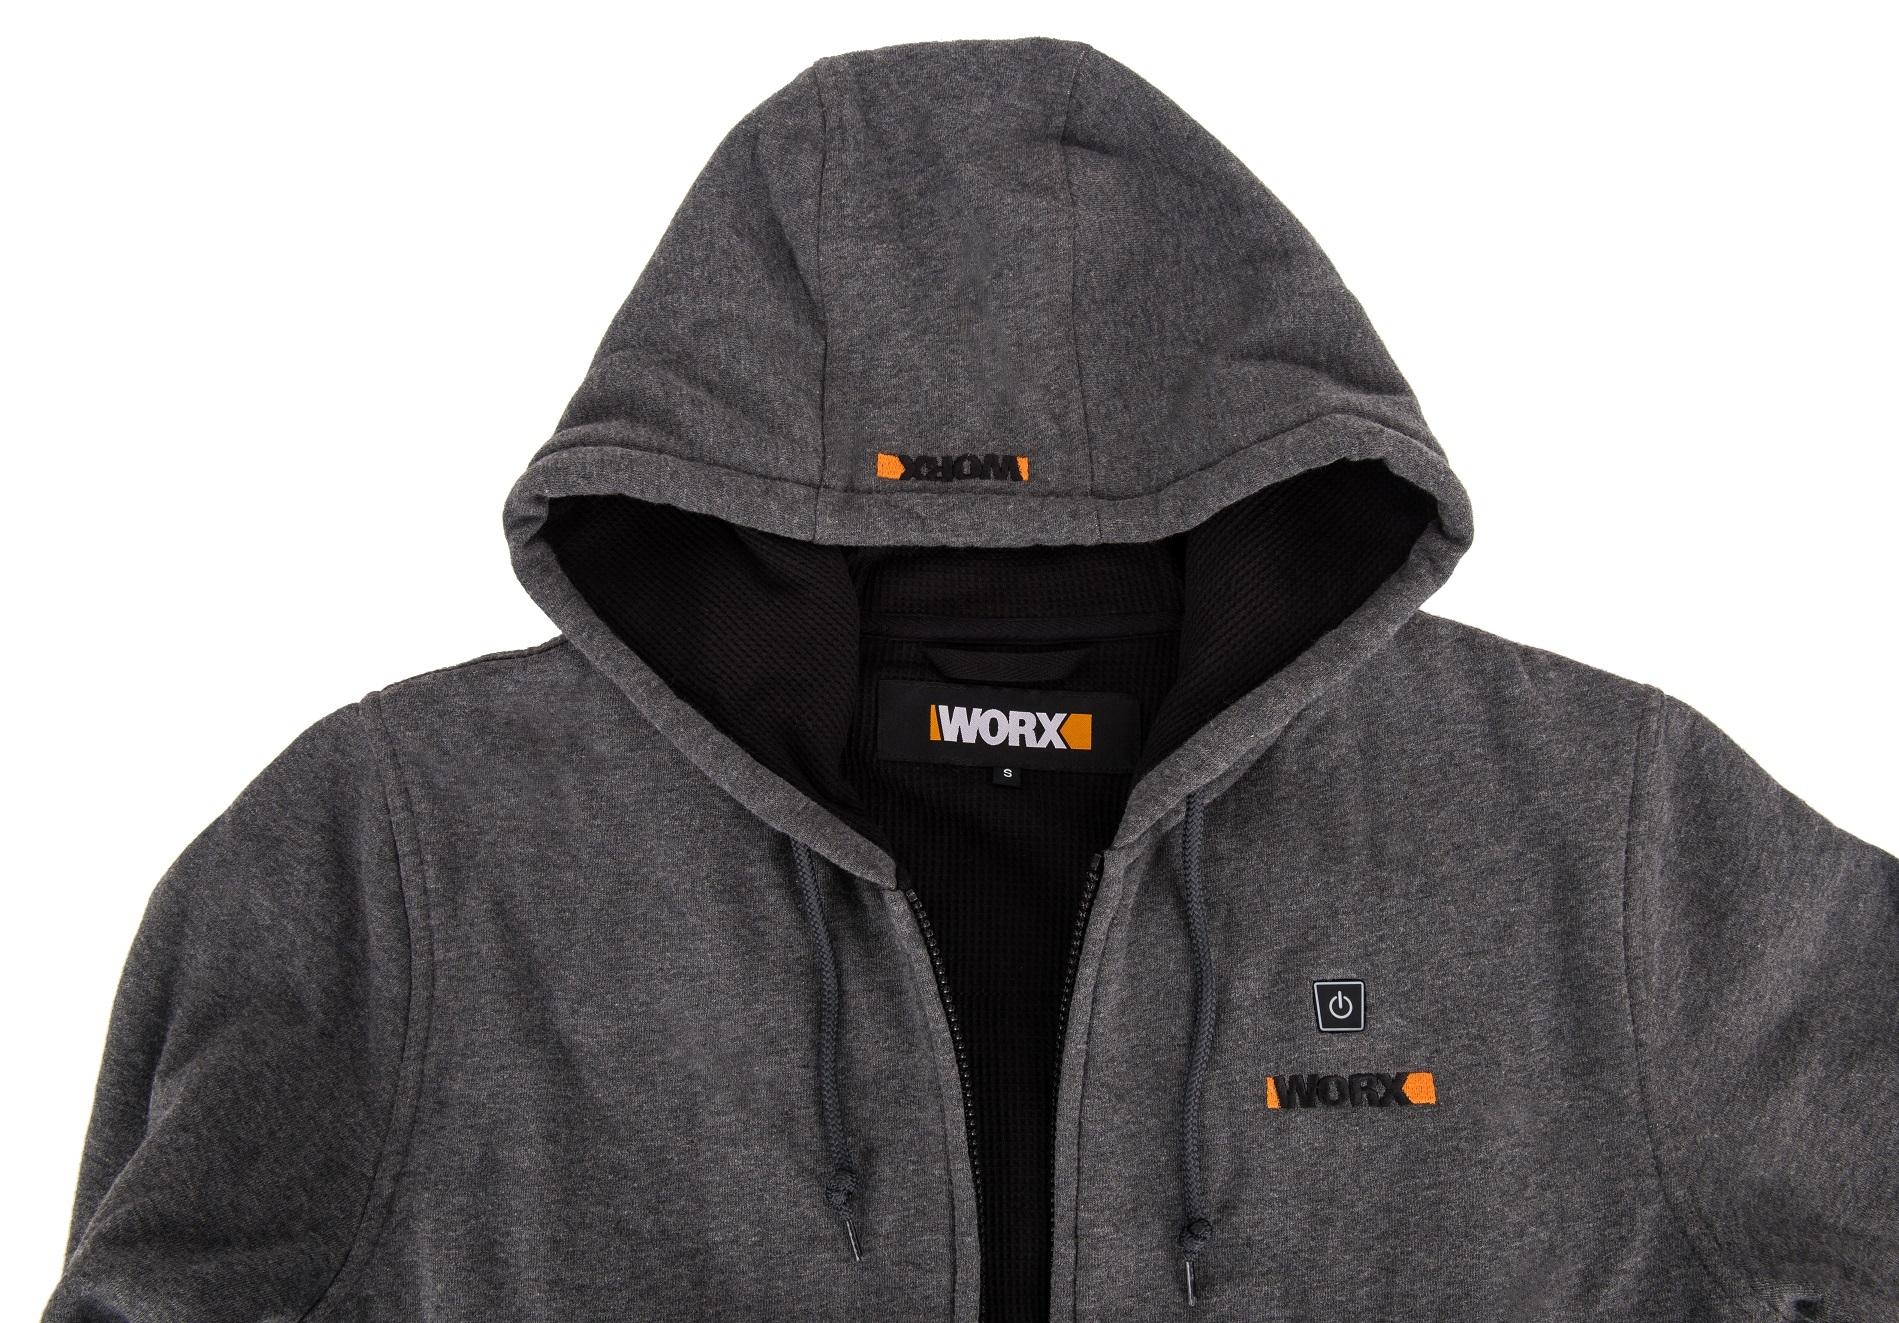 Куртка с подогревом Worx WA4660 4XL темно-серая